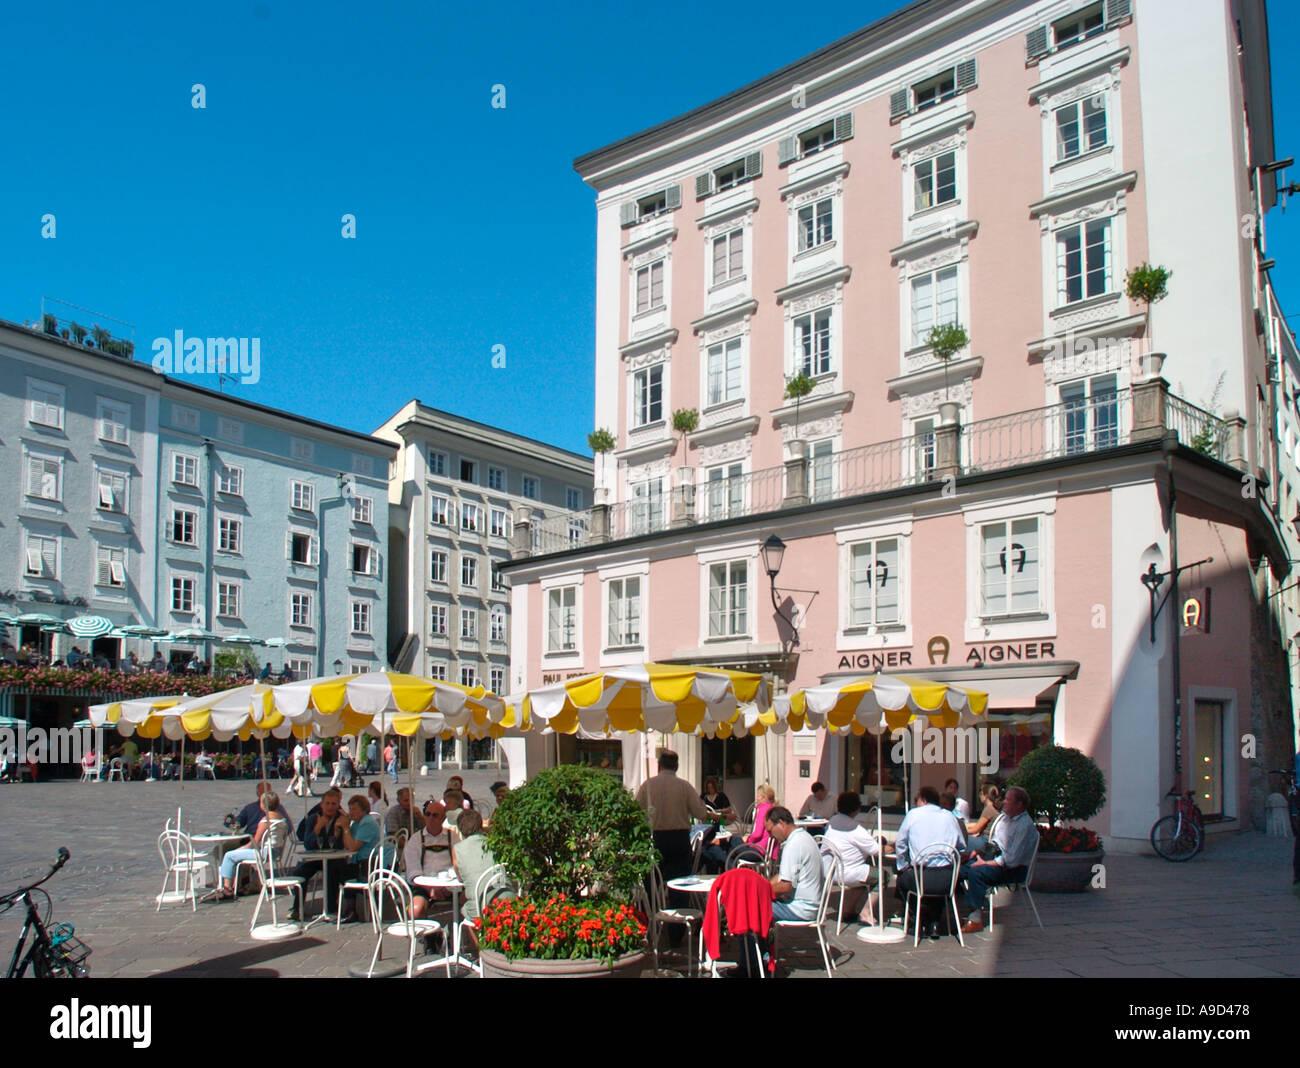 Street cafe in the Old Town (Altstadt), Salzburg, Austria - Stock Image